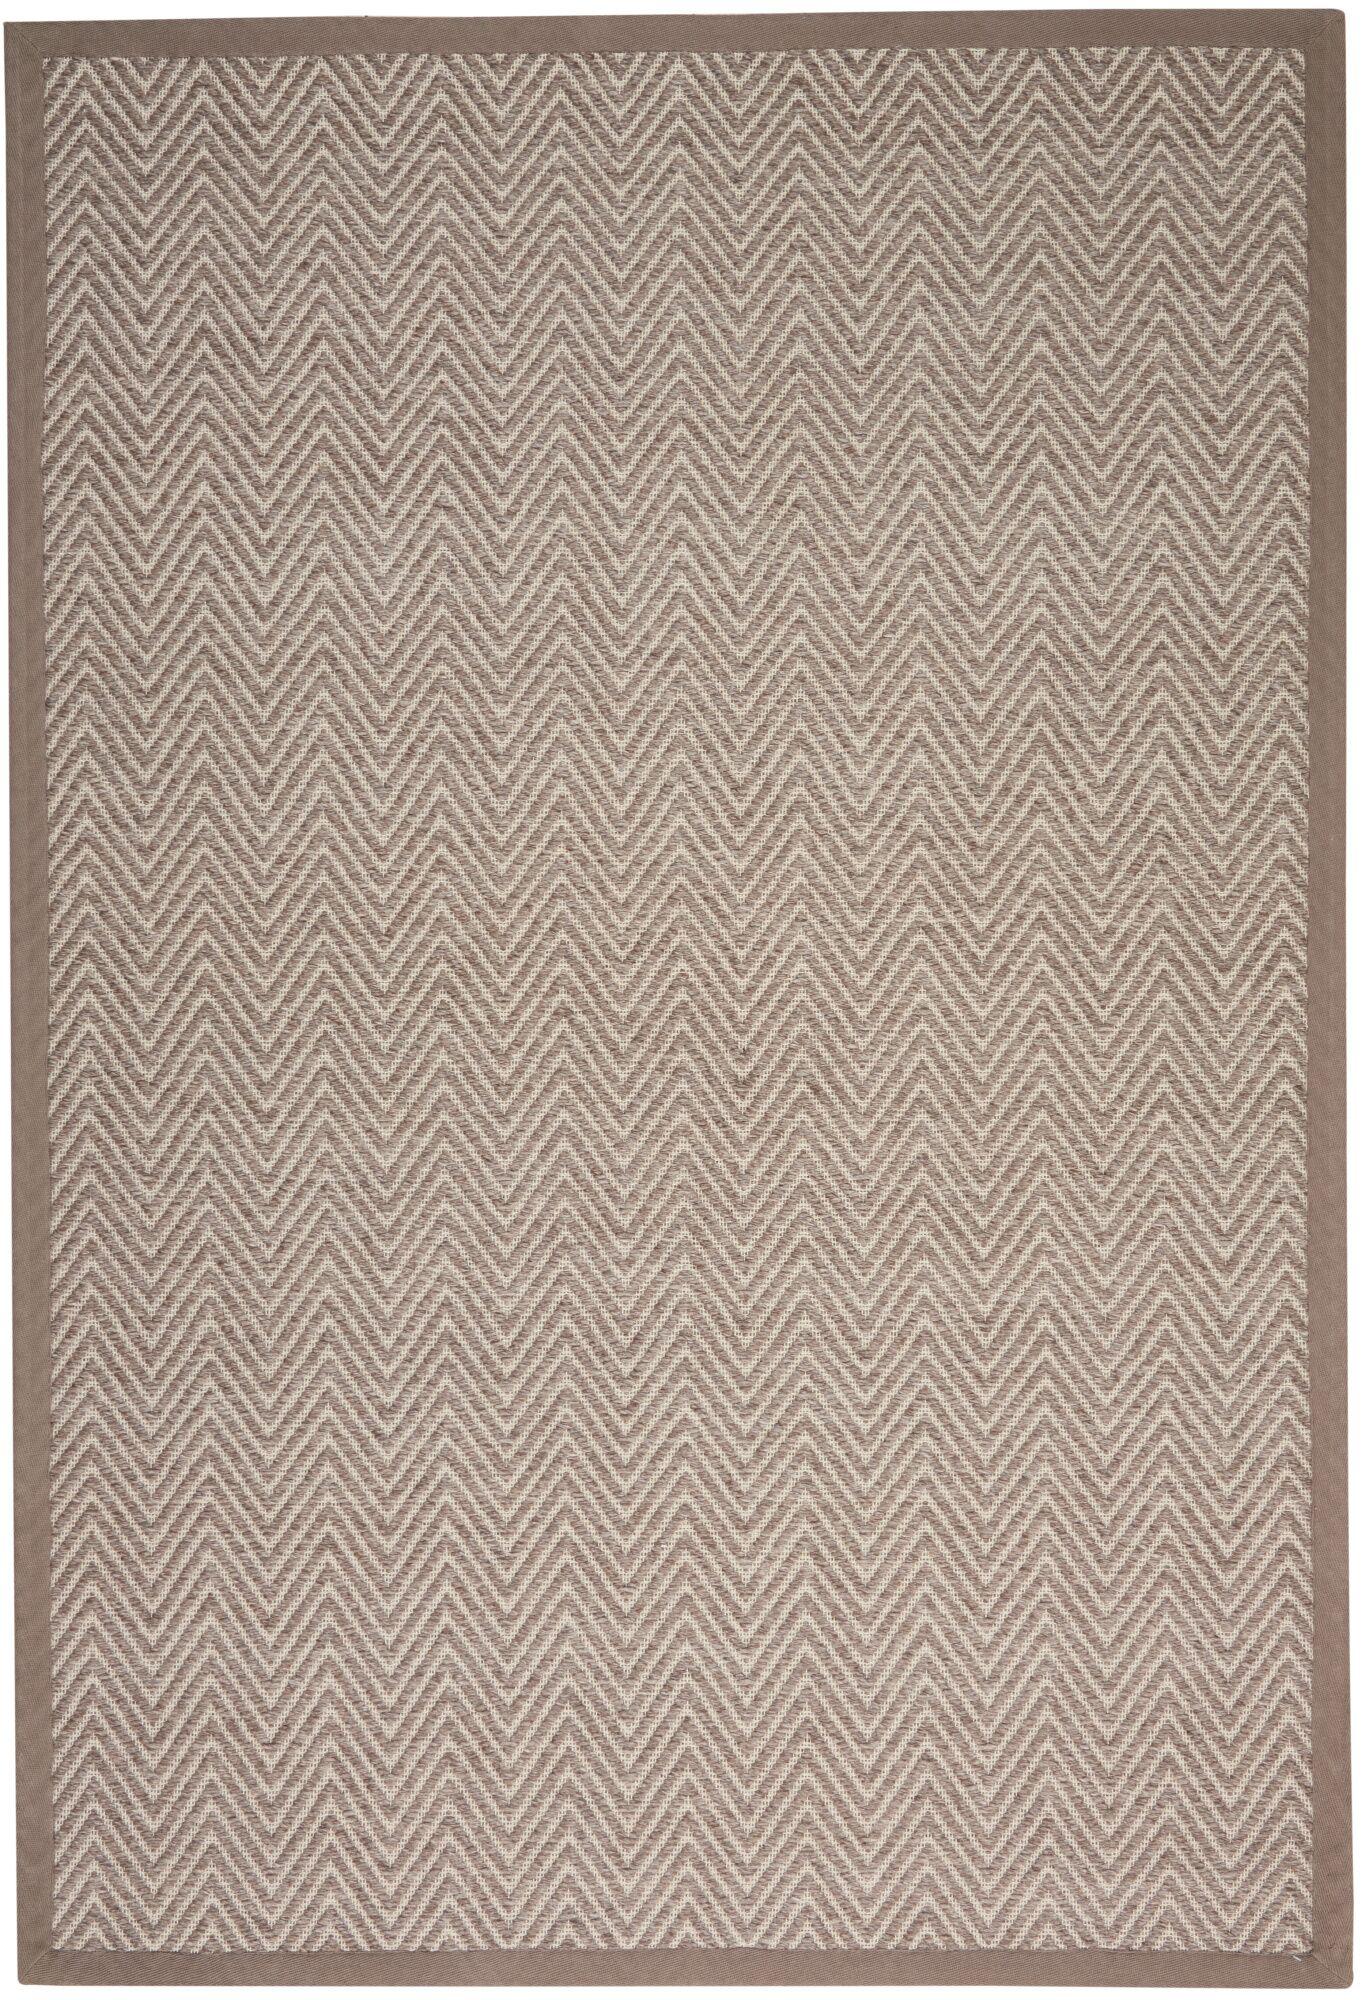 Uleena Hand-Woven Flannel Area Rug Rug Size: Rectangle 5' x 7'6